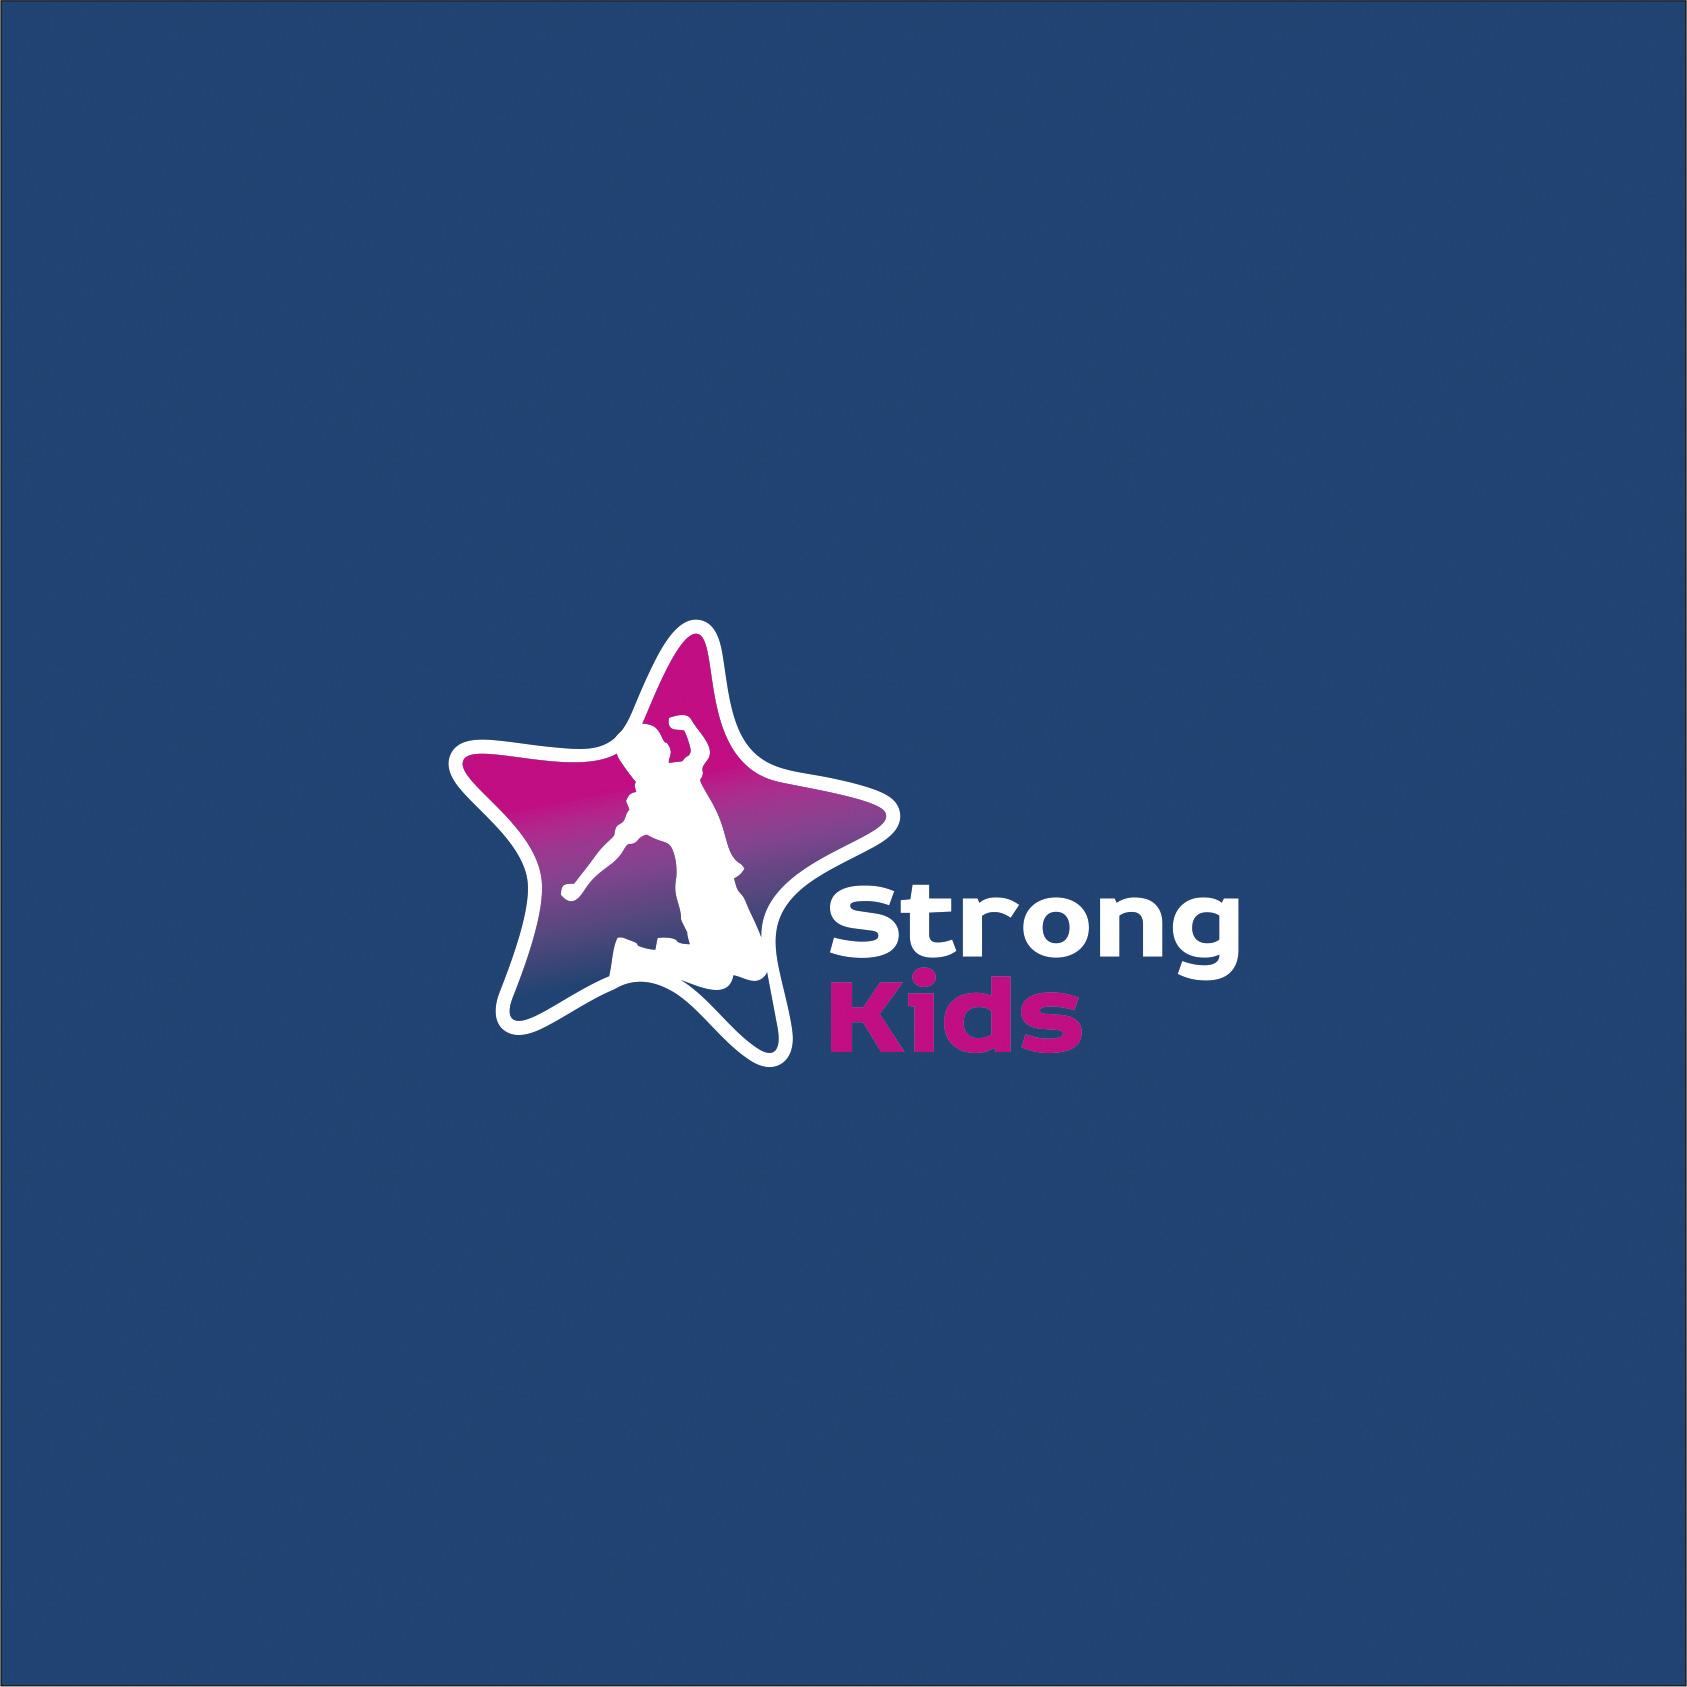 Логотип для Детского Интернет Магазина StrongKids фото f_2045c653f3c899aa.jpg